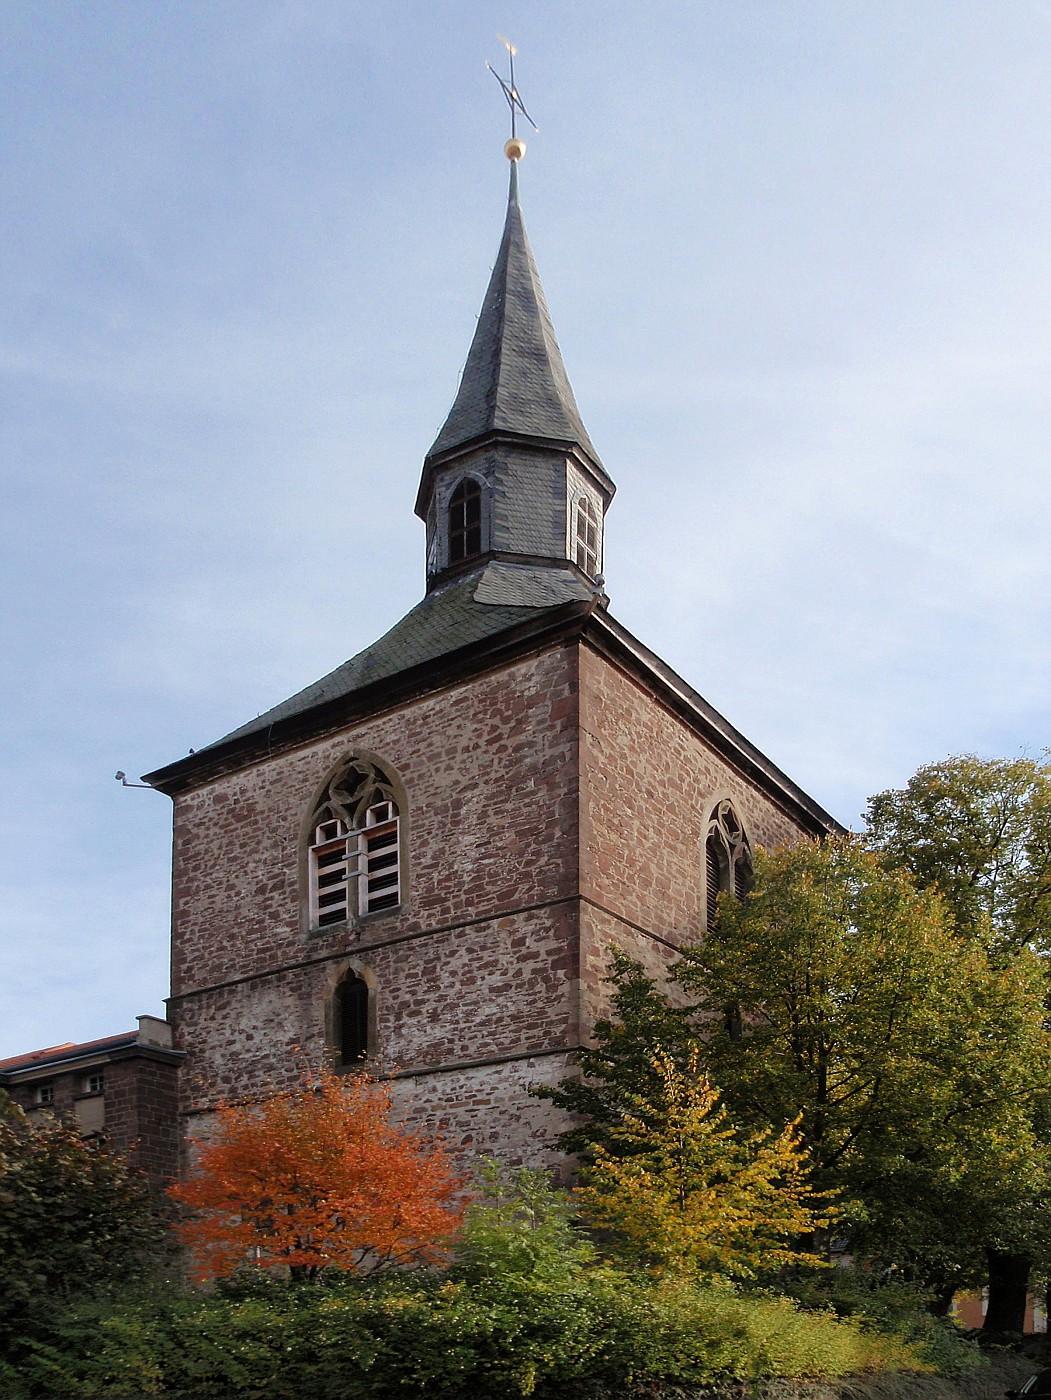 Martiniturm